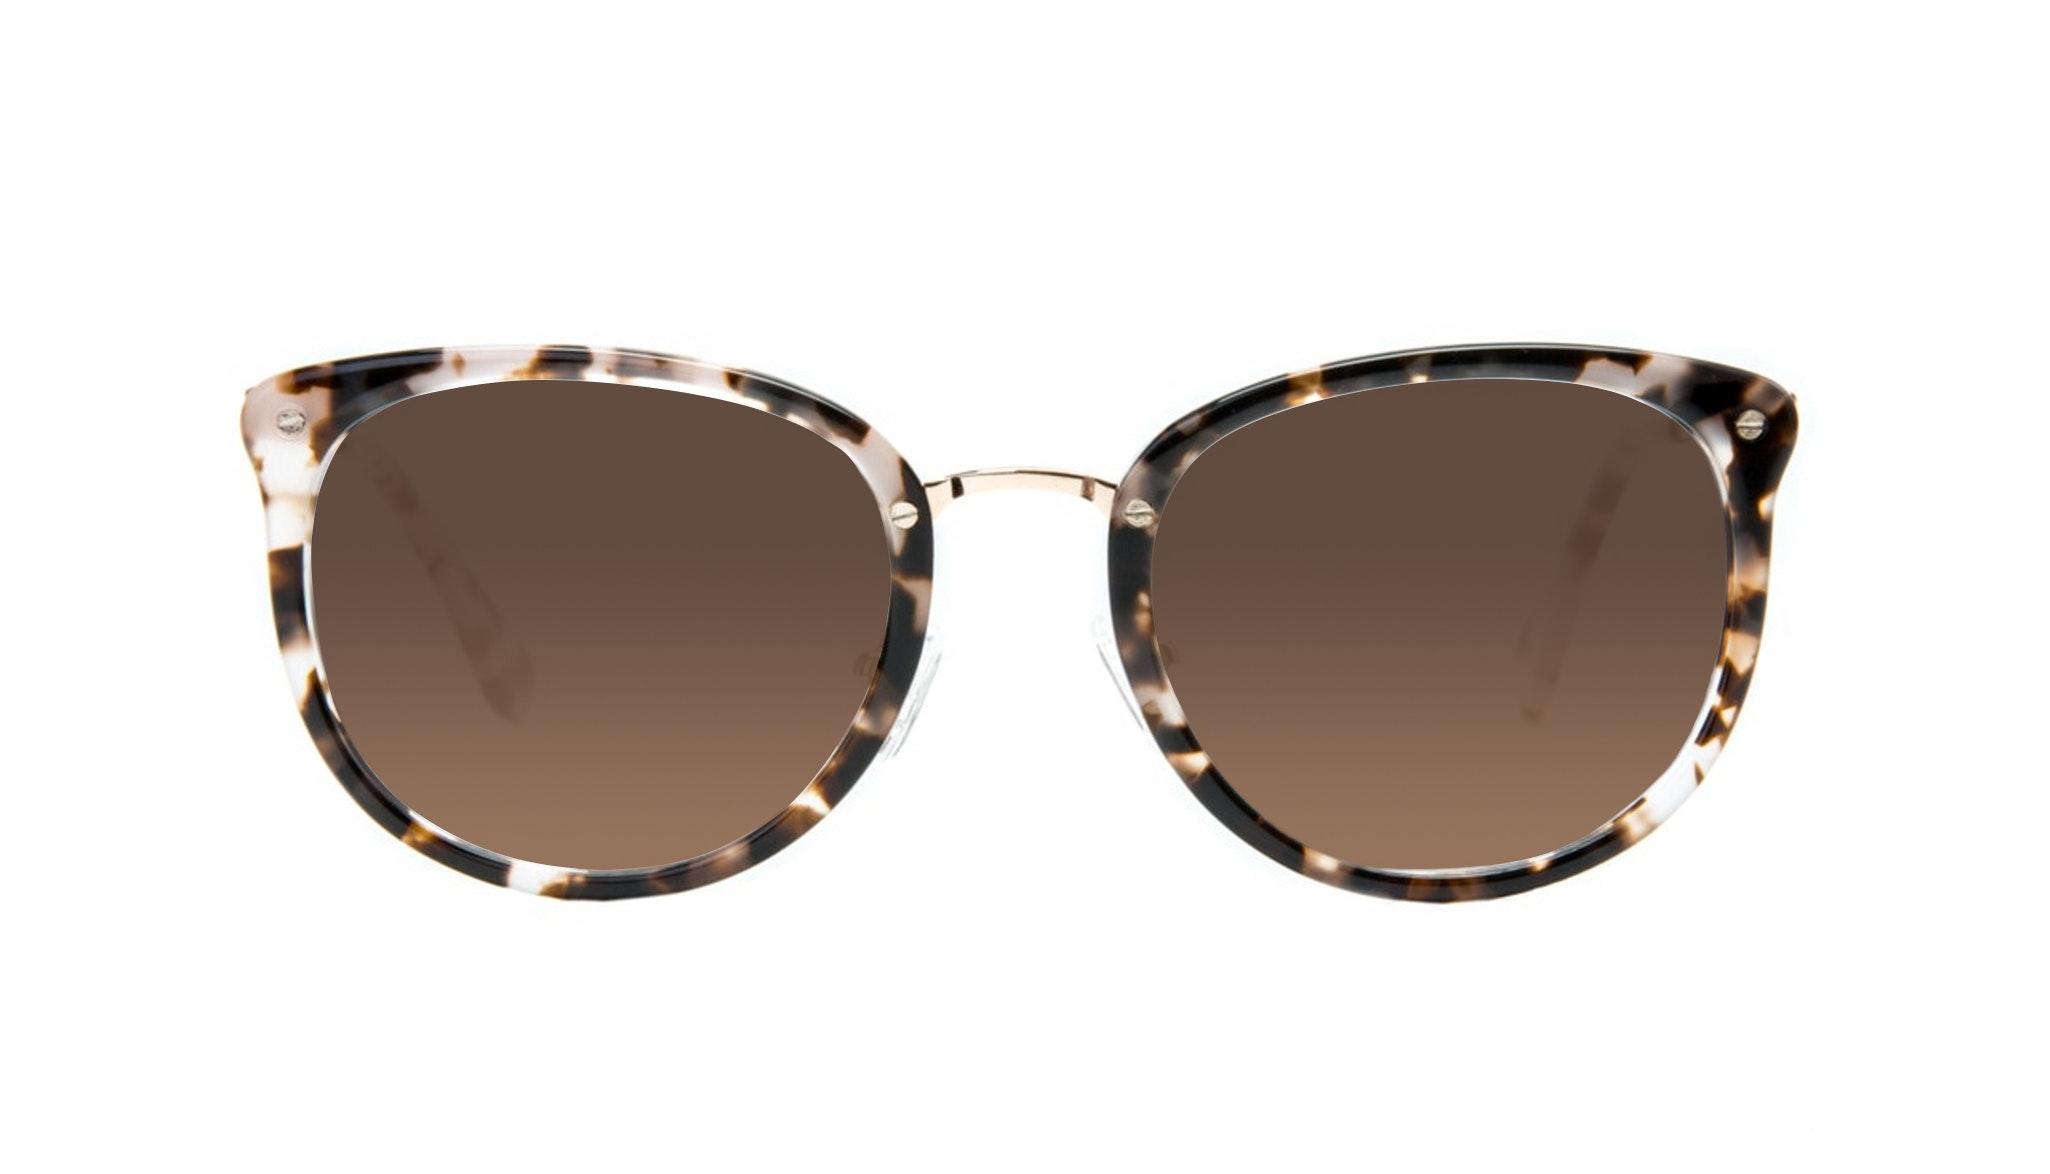 Affordable Fashion Glasses Square Round Sunglasses Women Amaze Mocha Tortoise